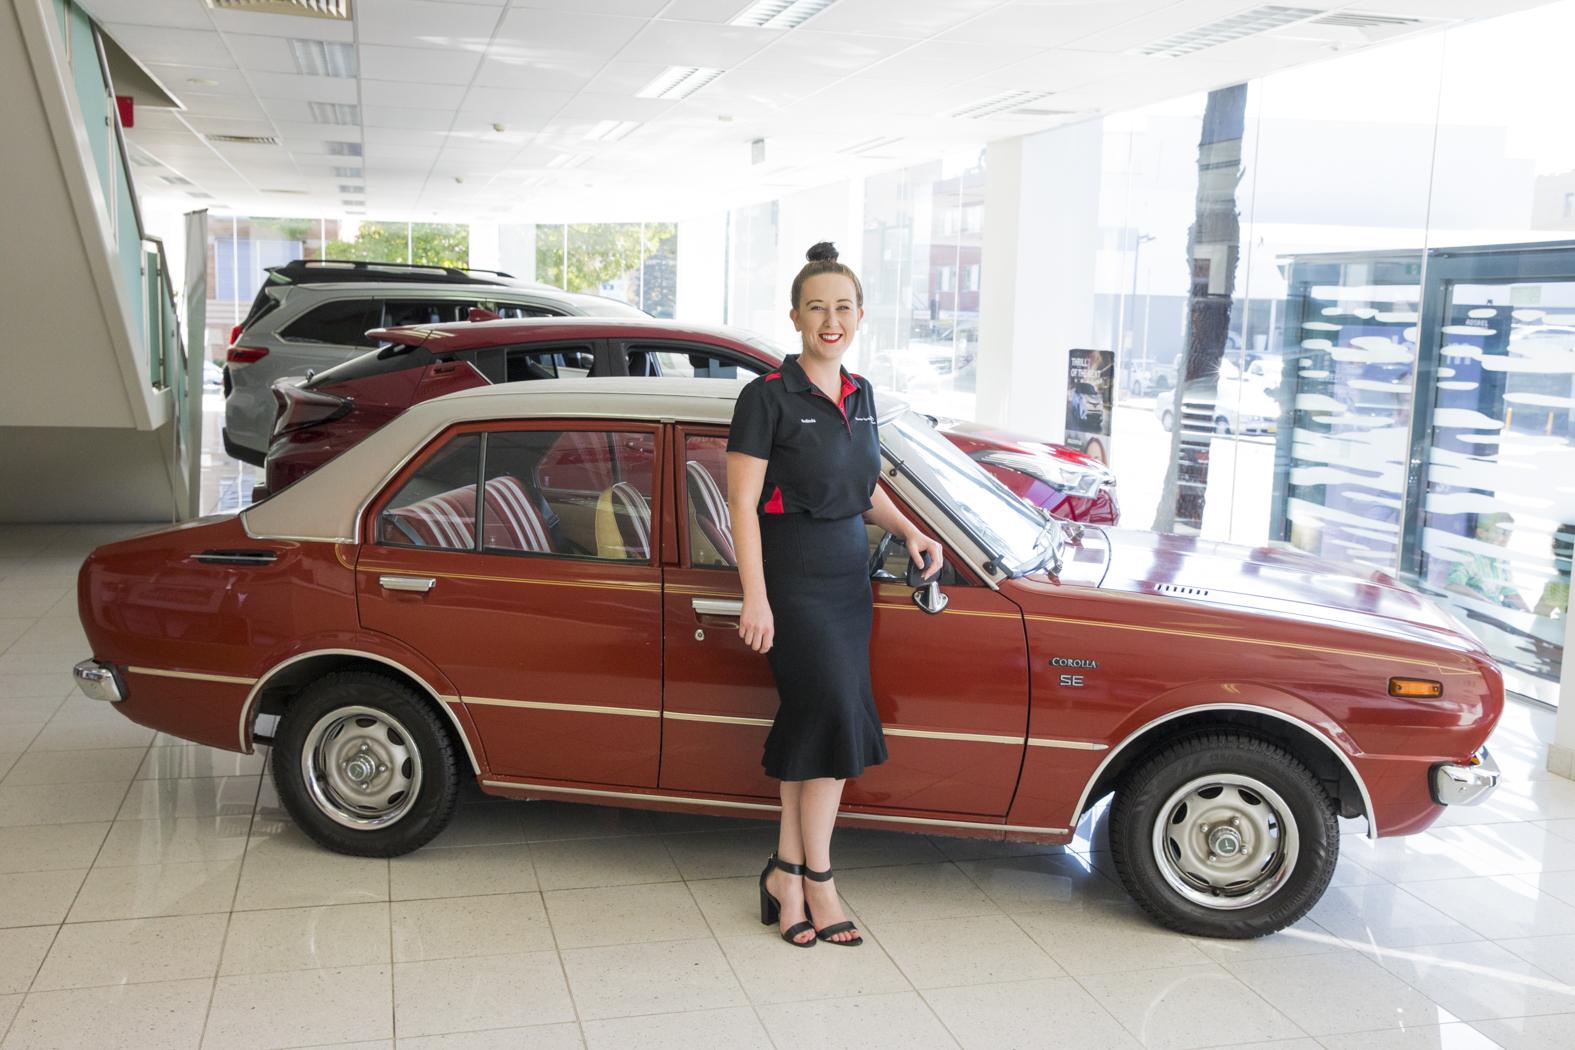 Belinda and her prized 1975 Toyota Corolla.